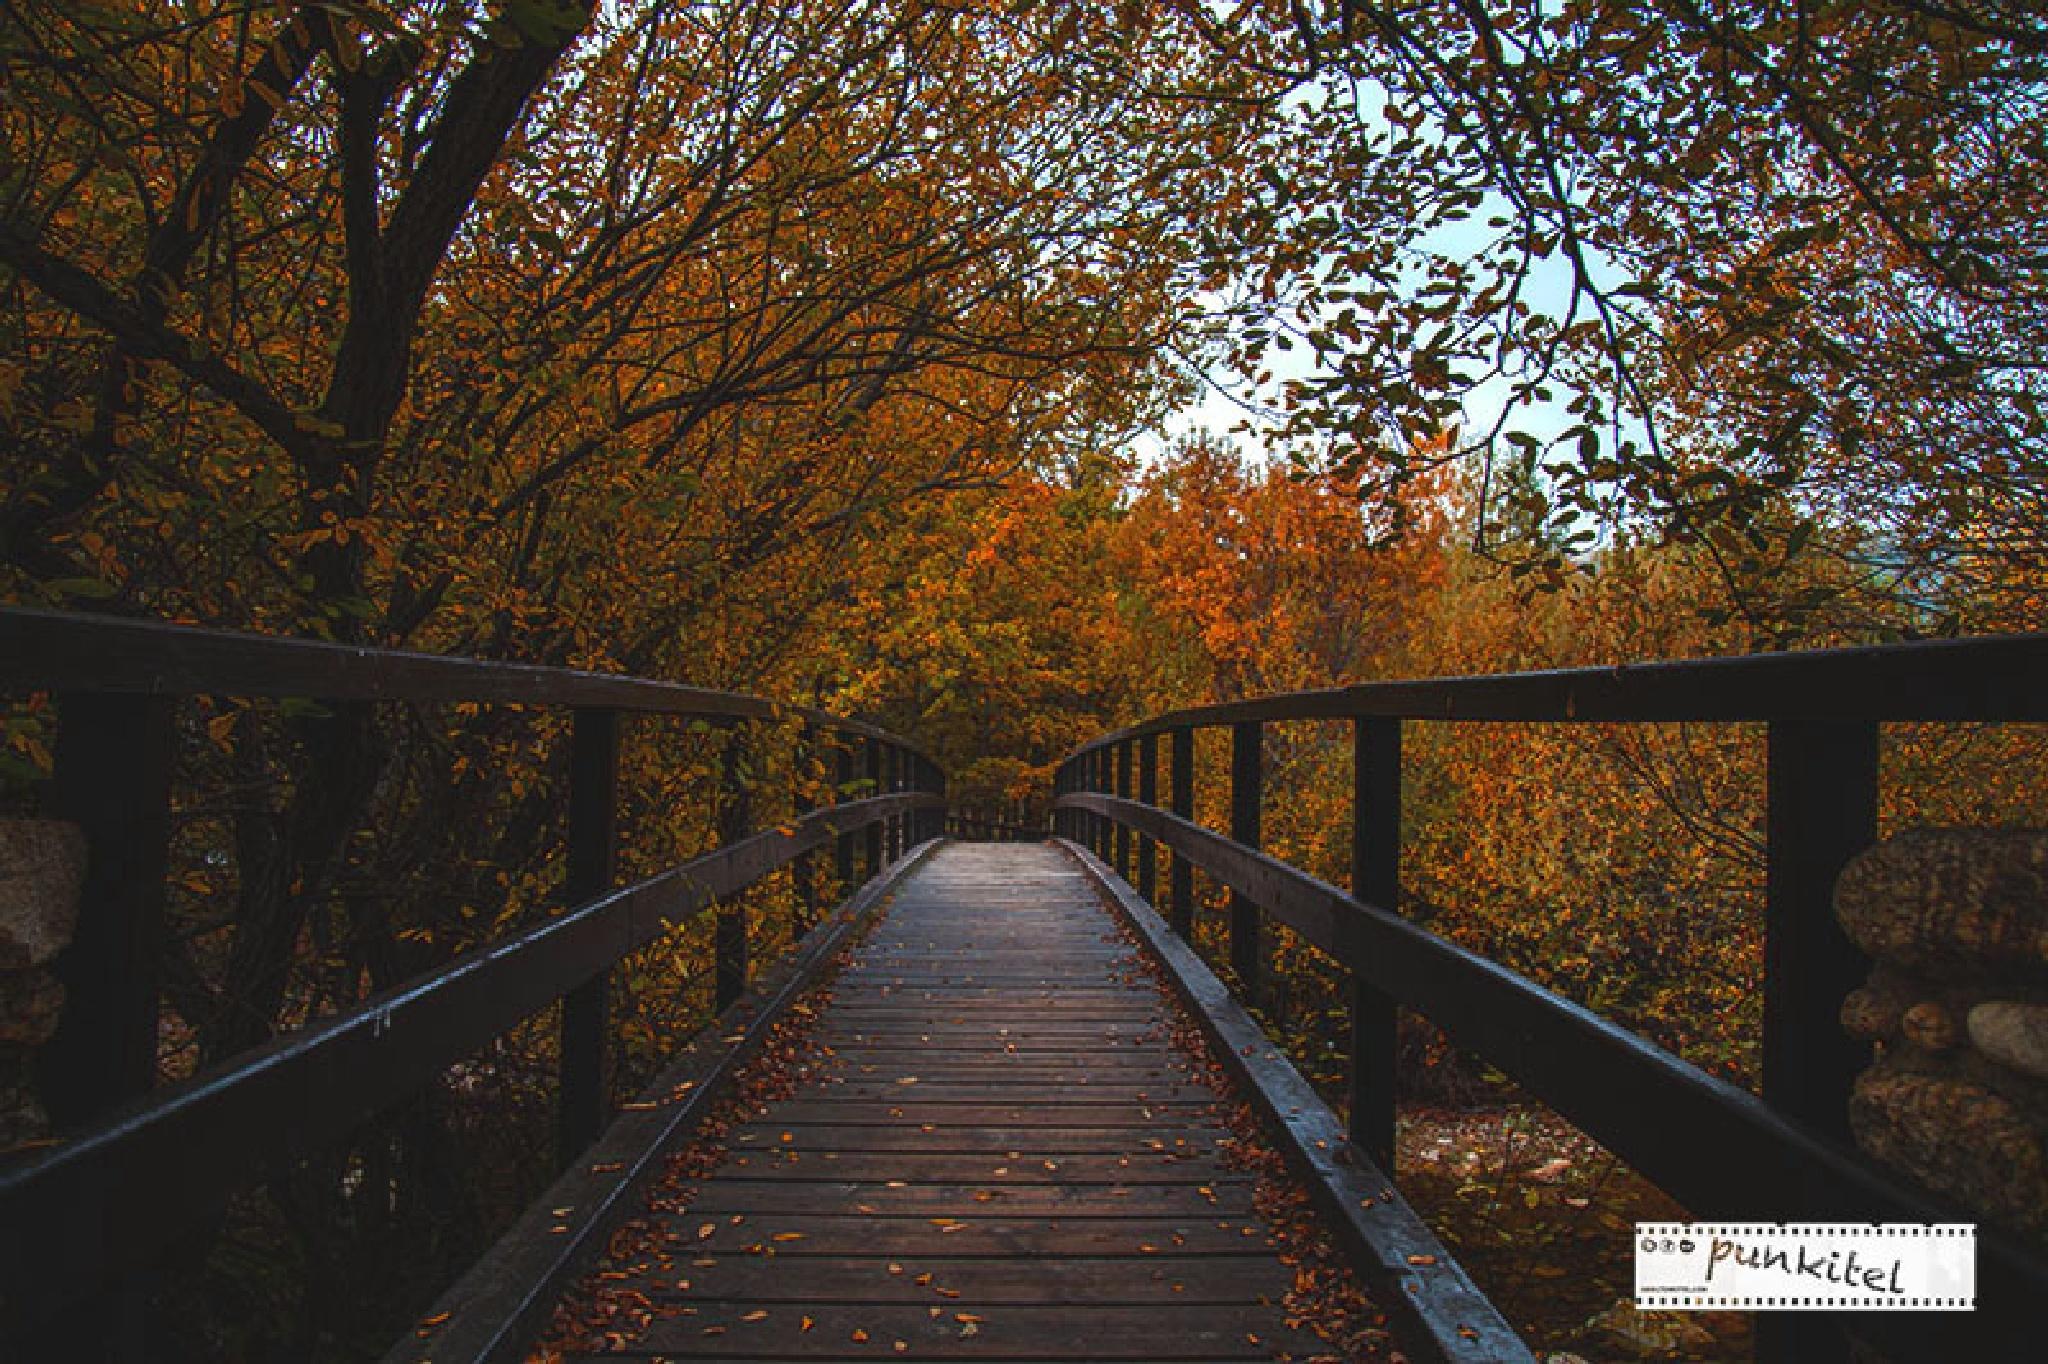 Autumn by punkitel